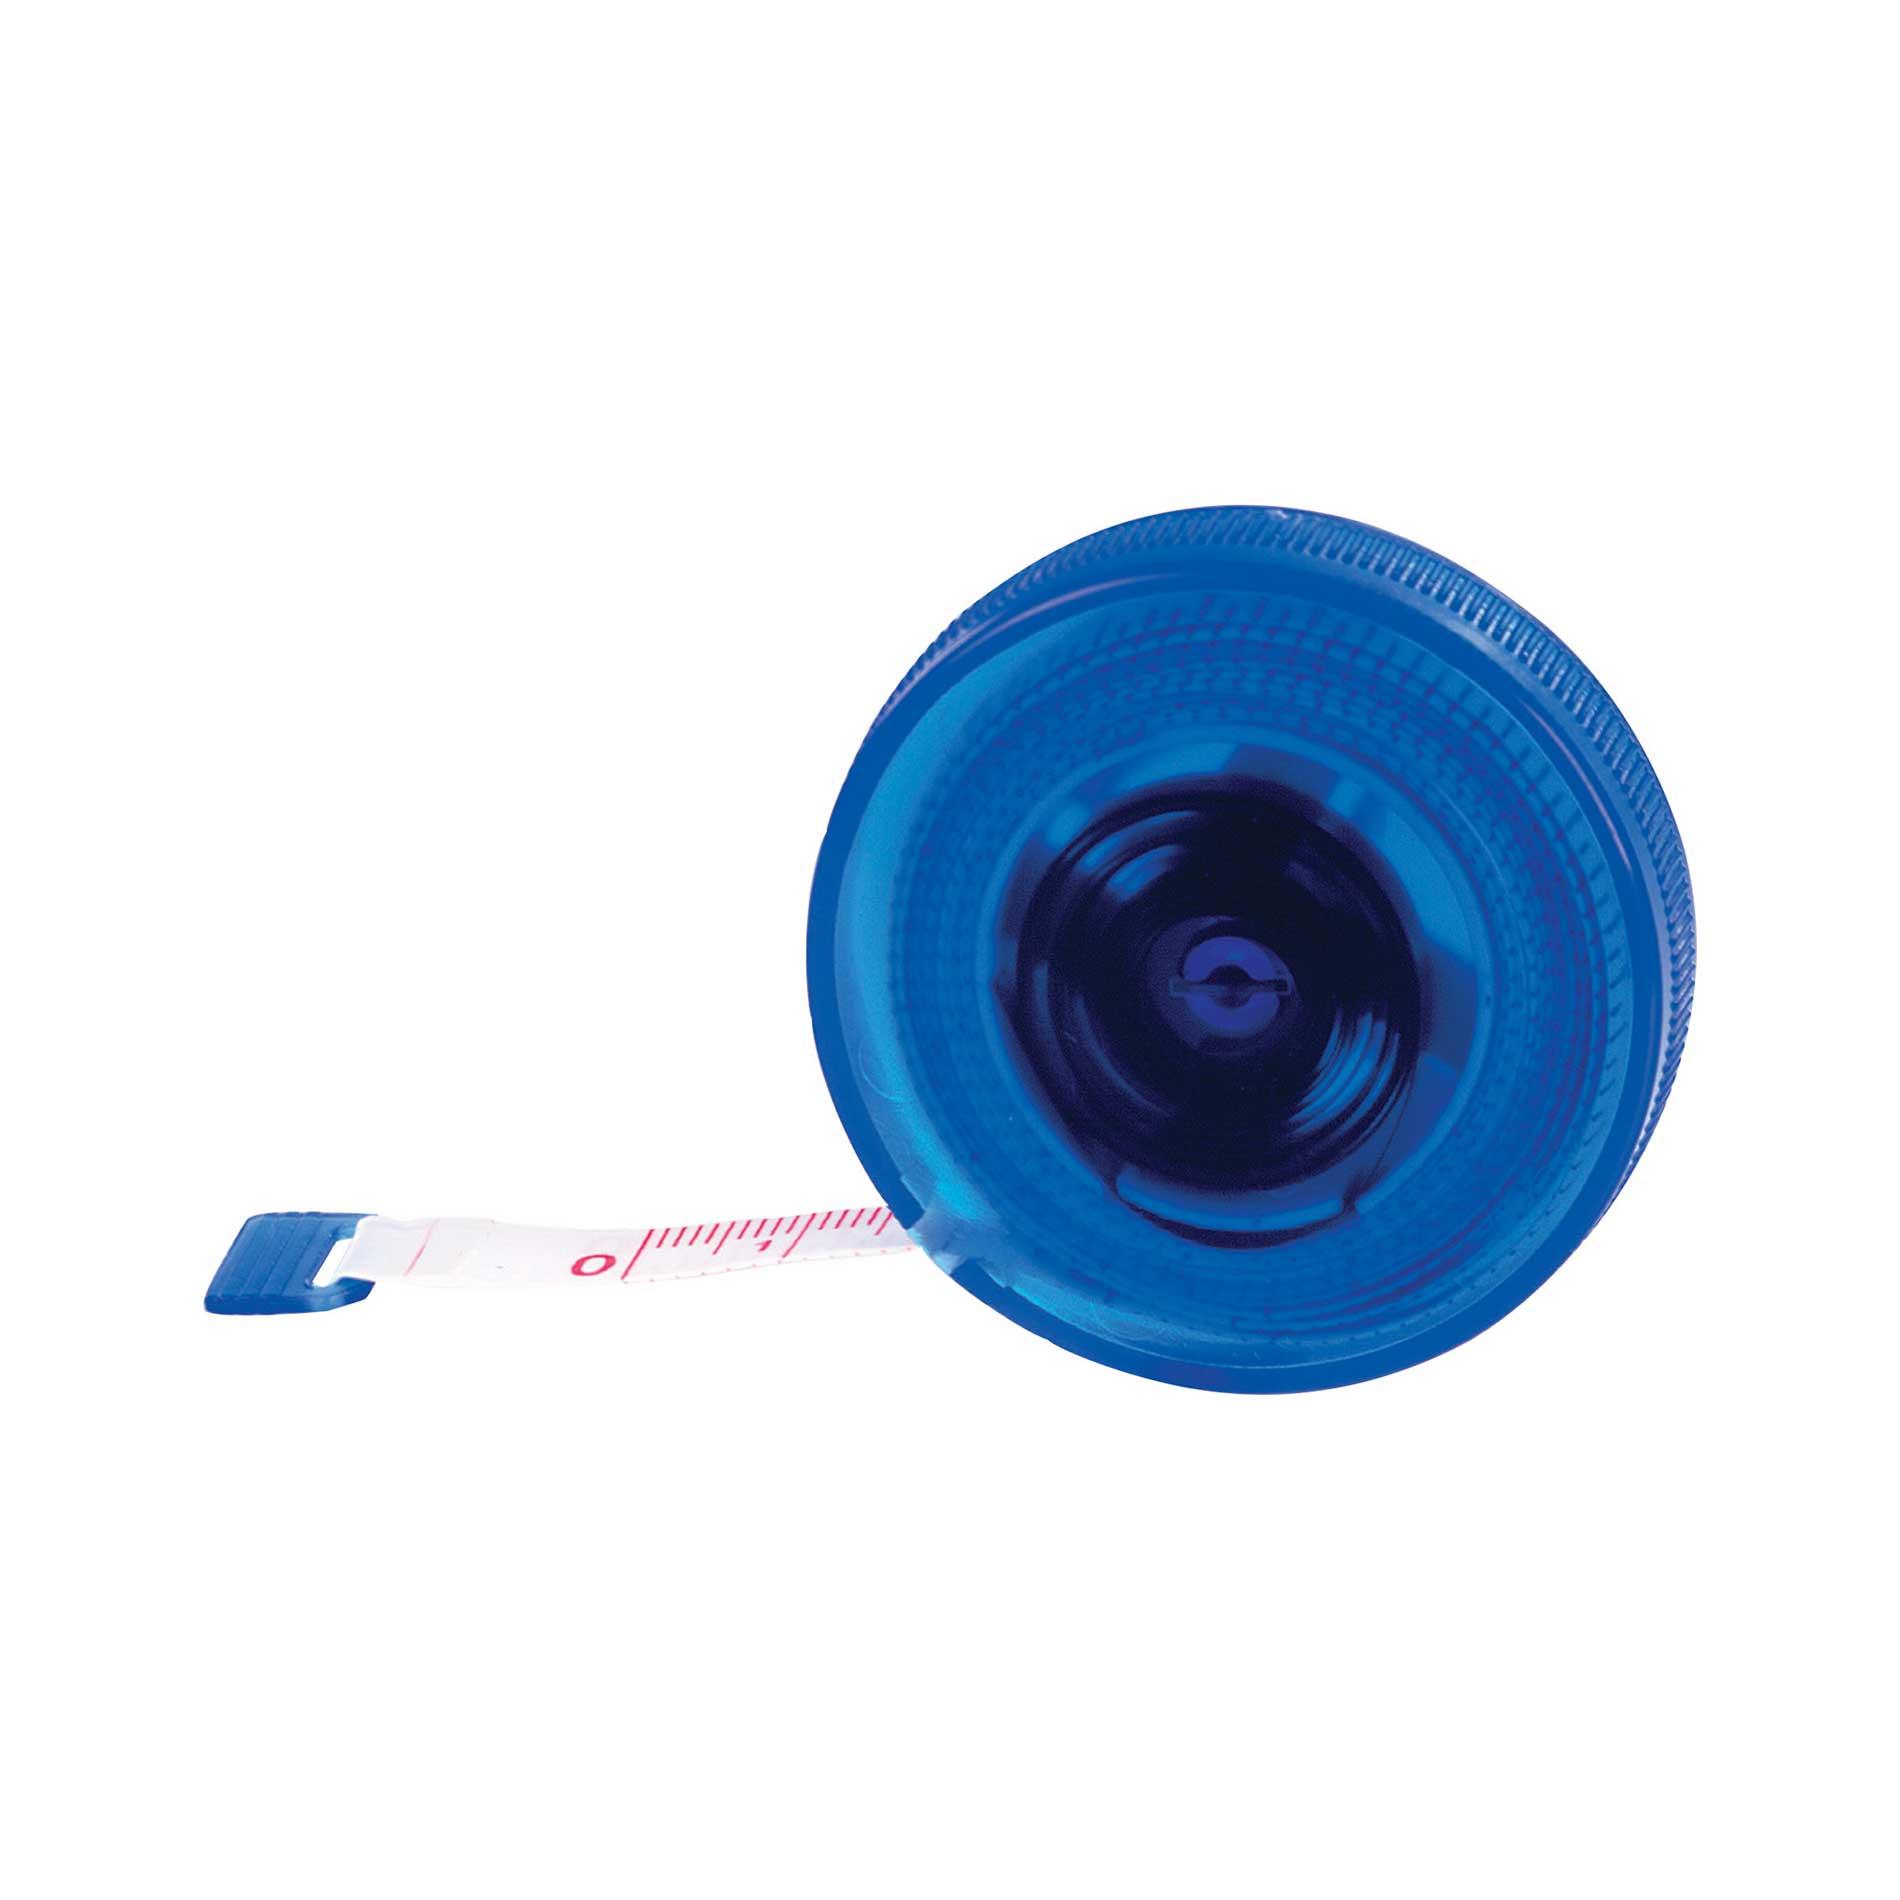 Tape measure blue